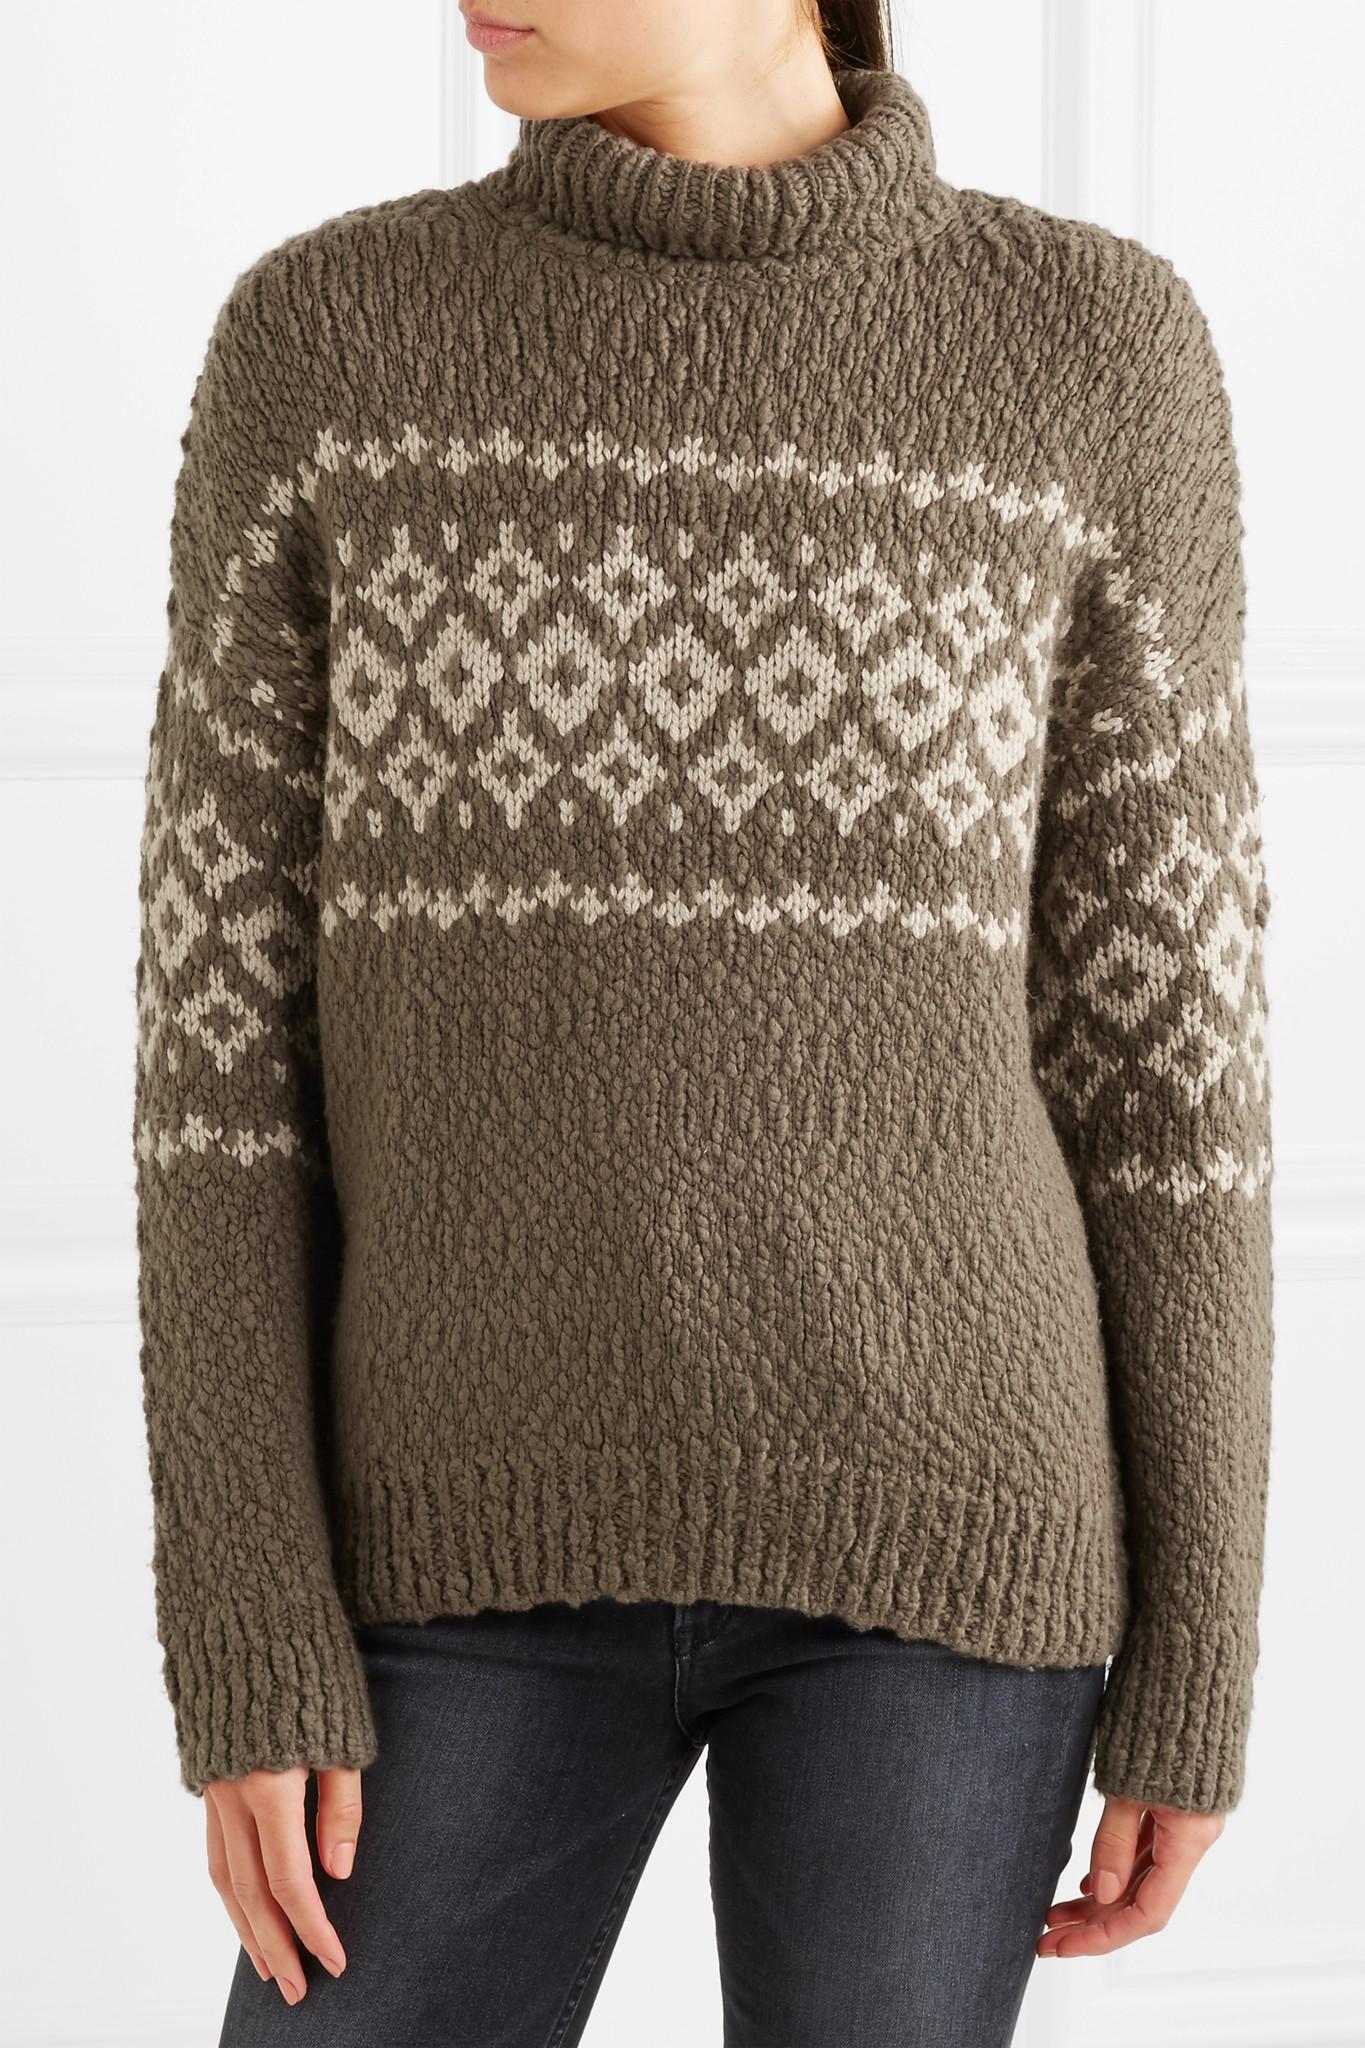 Vince Fair Isle Wool-blend Turtleneck Sweater in Gray | Lyst